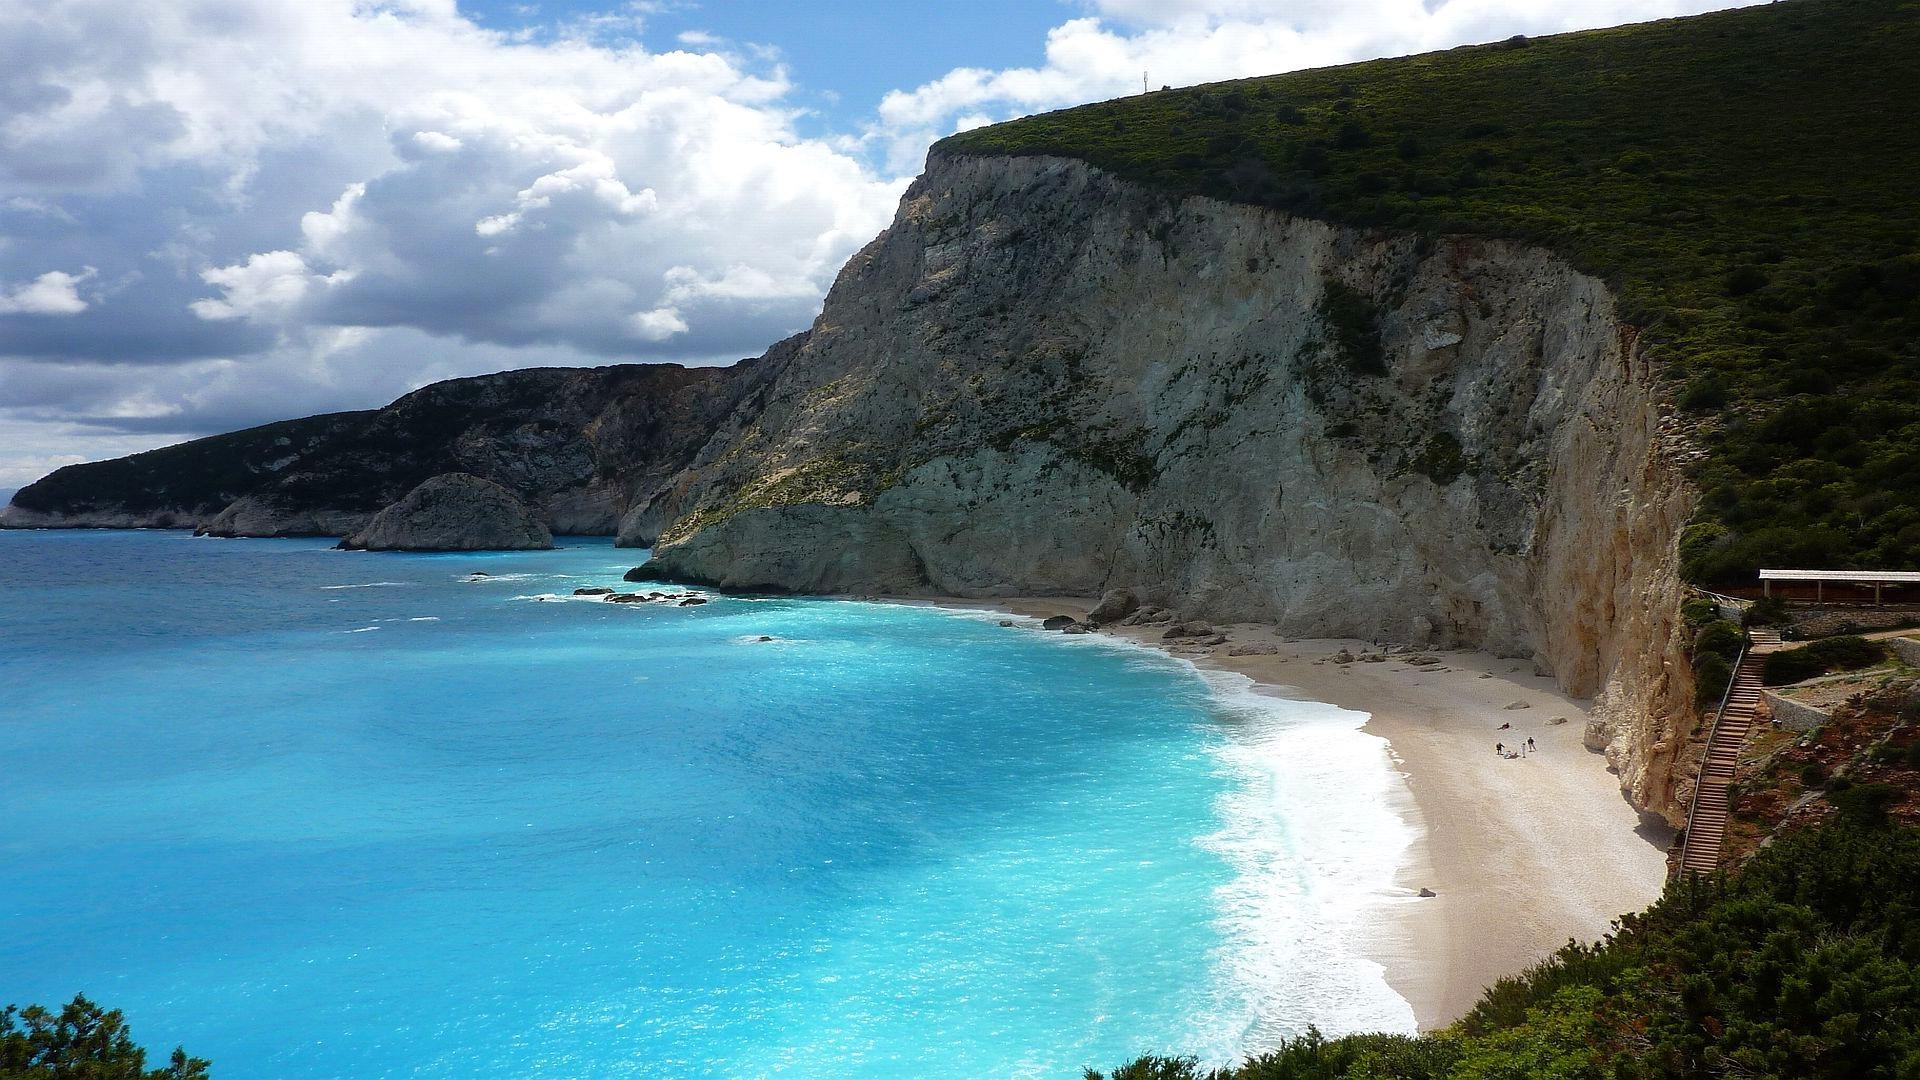 Wallpaper Landscape Sea Bay Rock Nature Beach Coast Cliff Greece